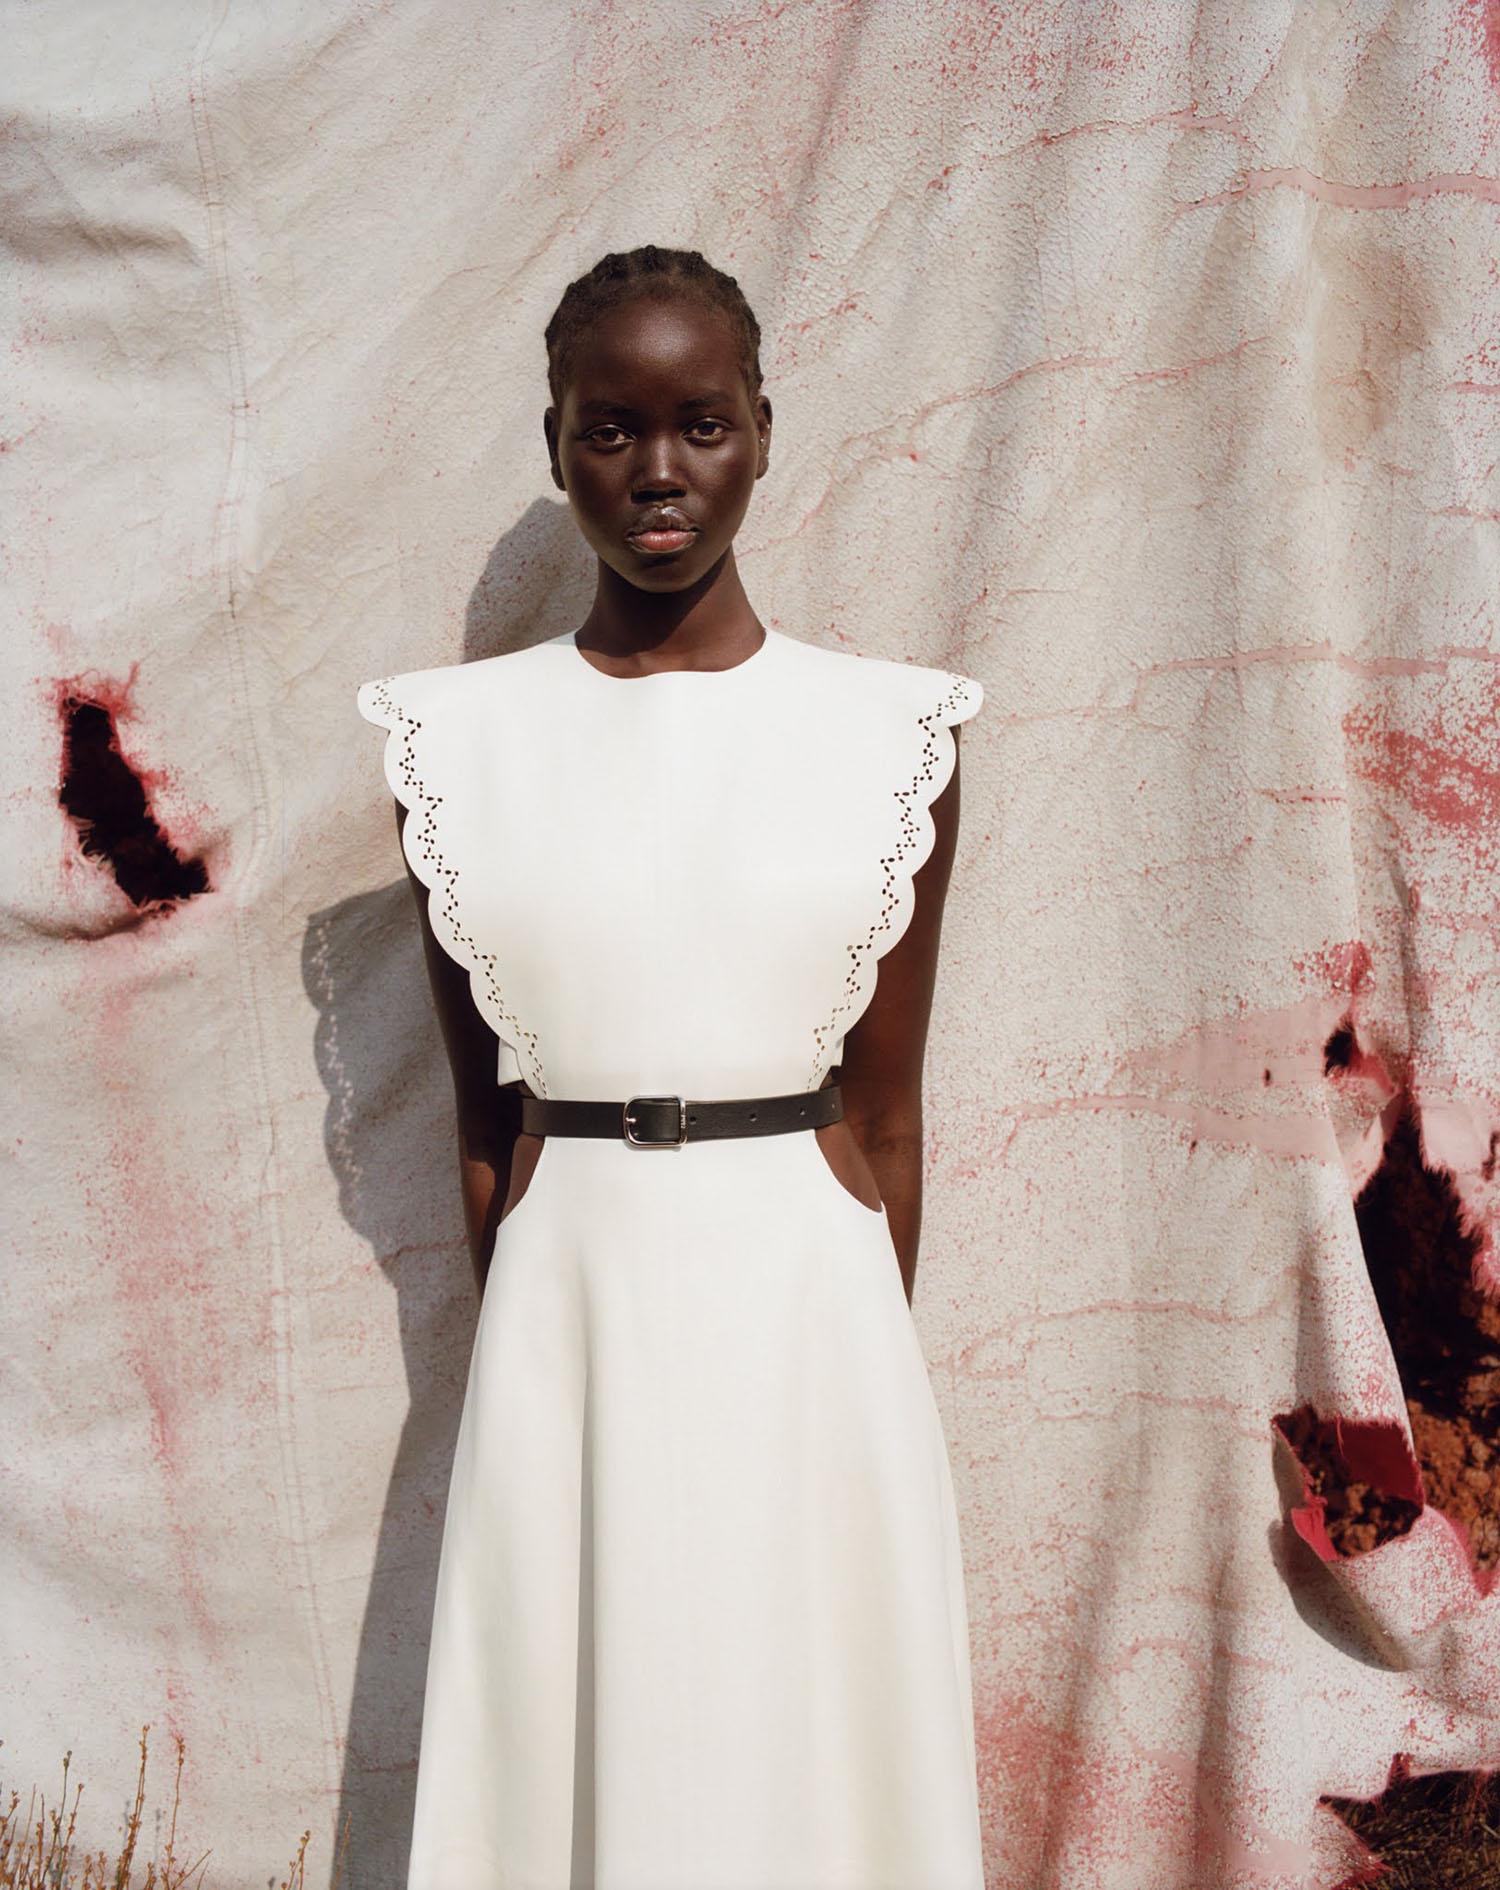 Adut Akech by Zoë Ghertner for Vogue US & British Vogue August 2021